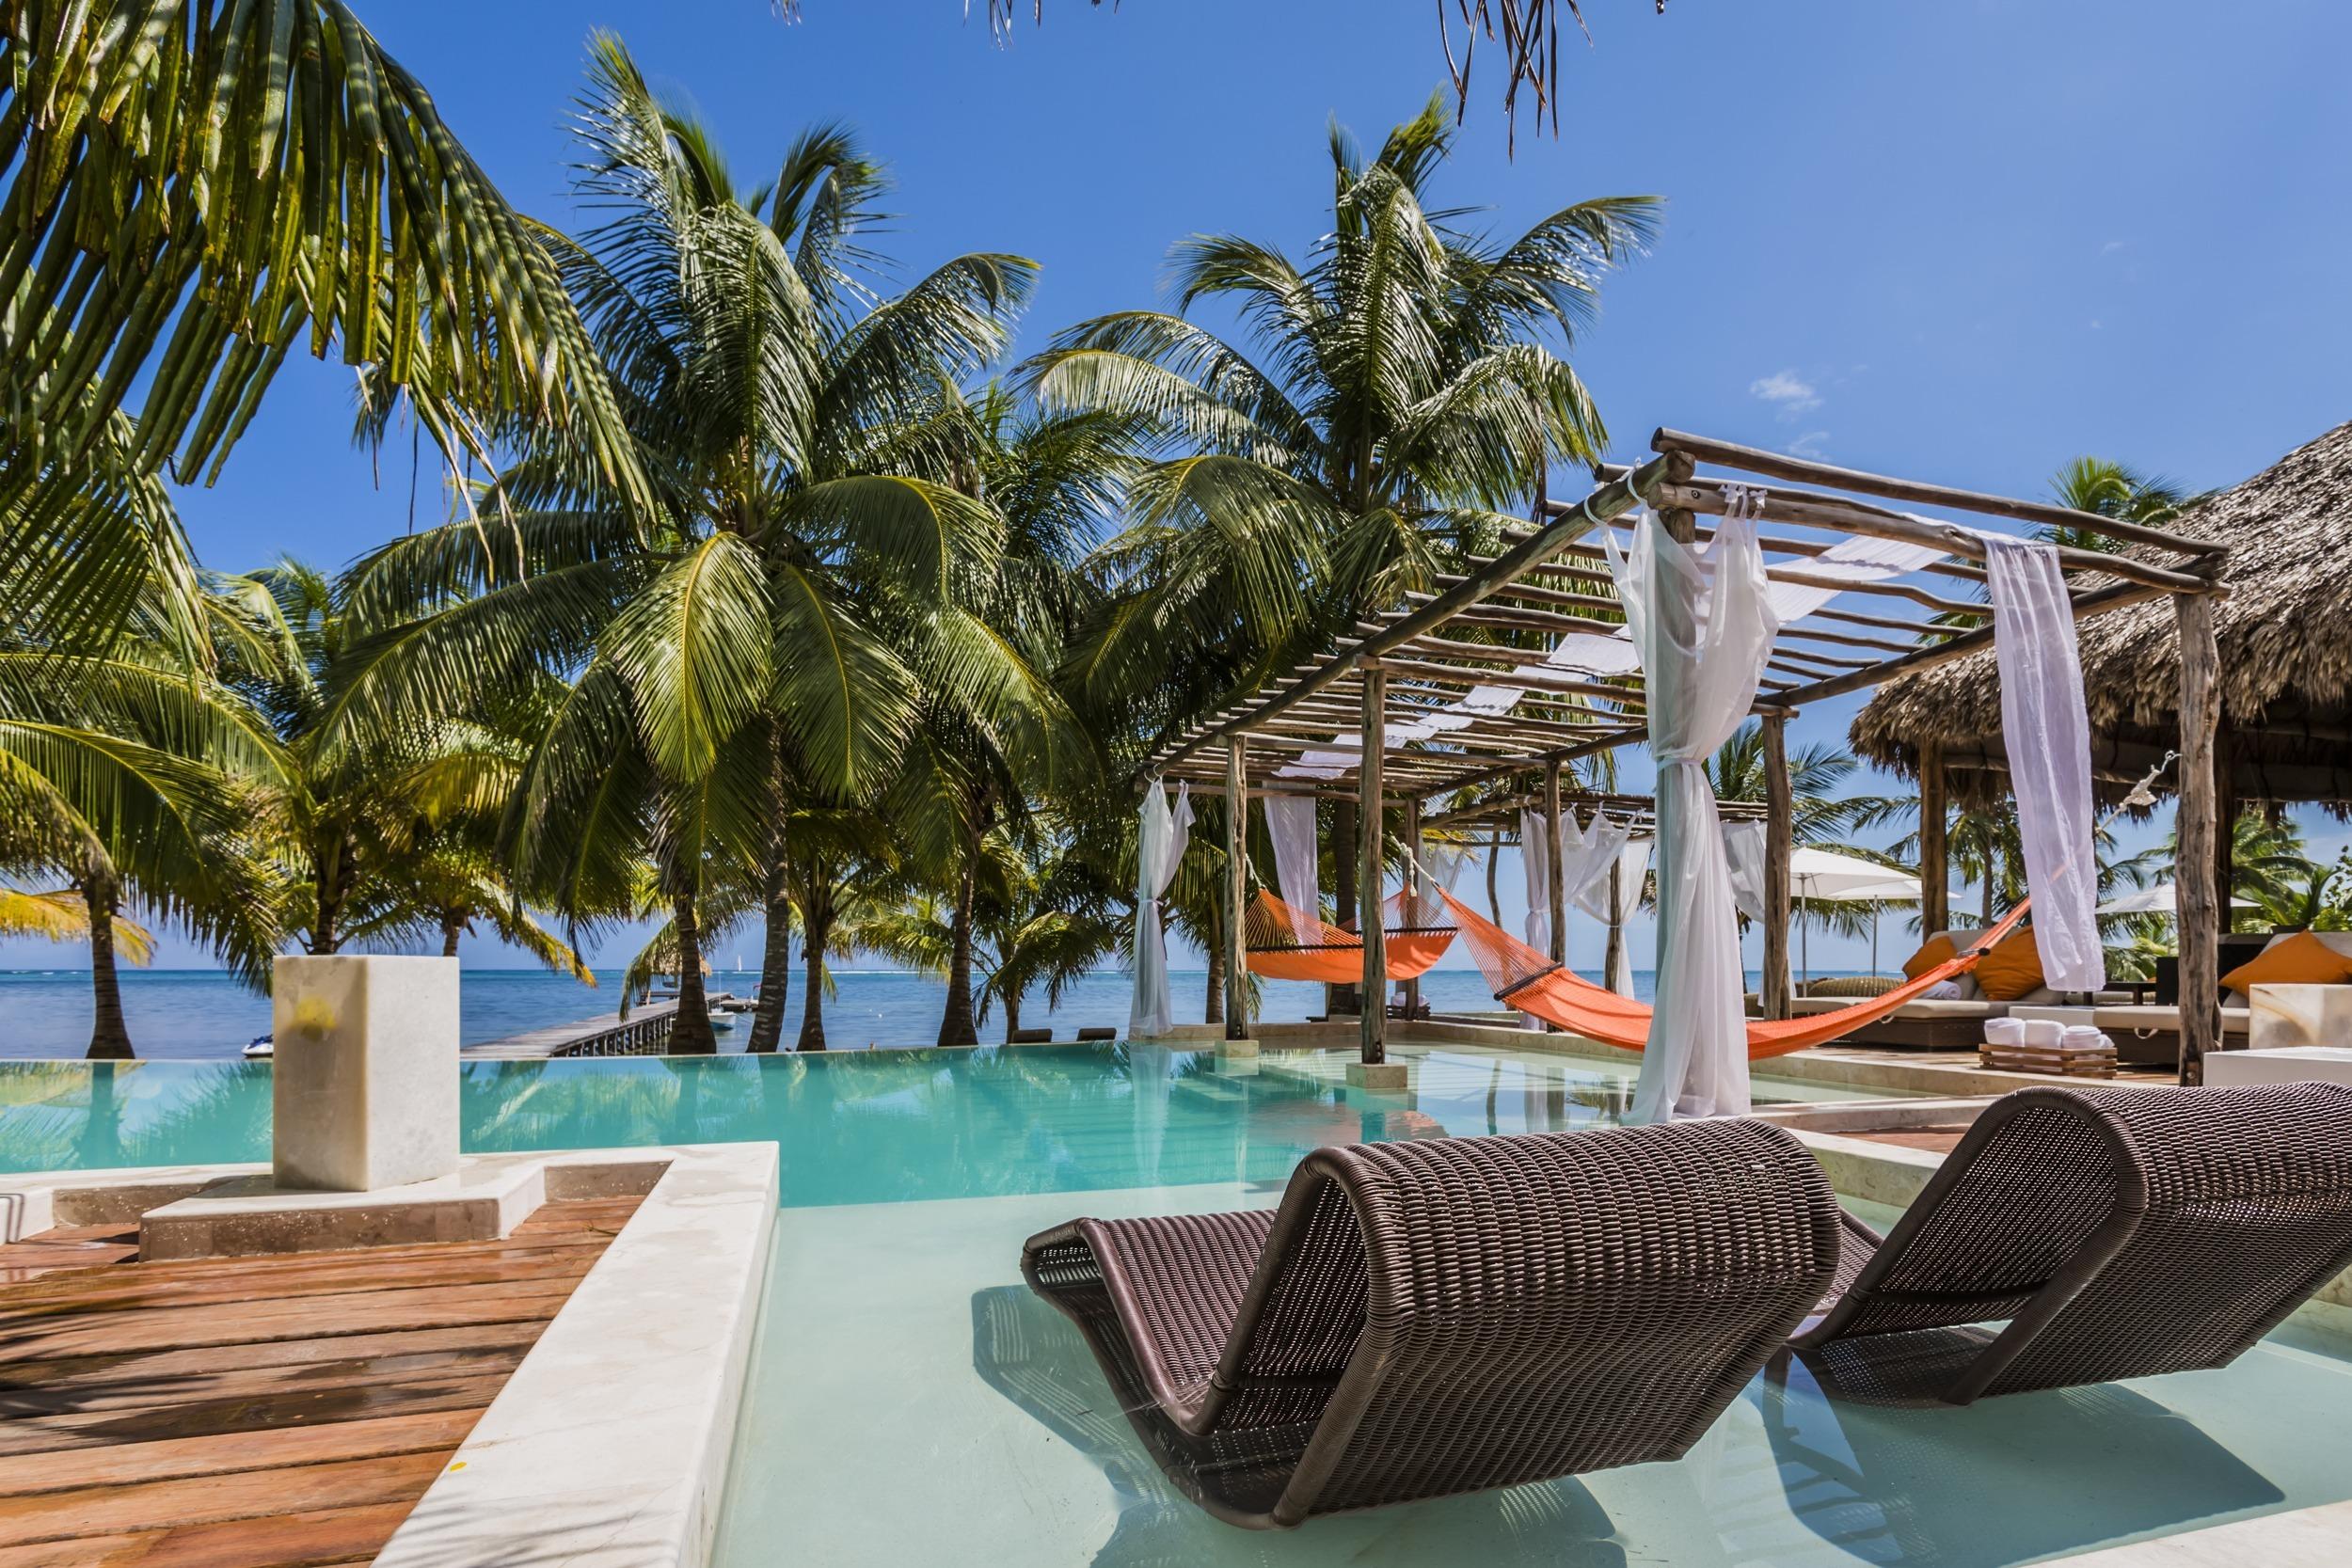 10 Bad Photos Of El Secreto Beach Resort In Belize